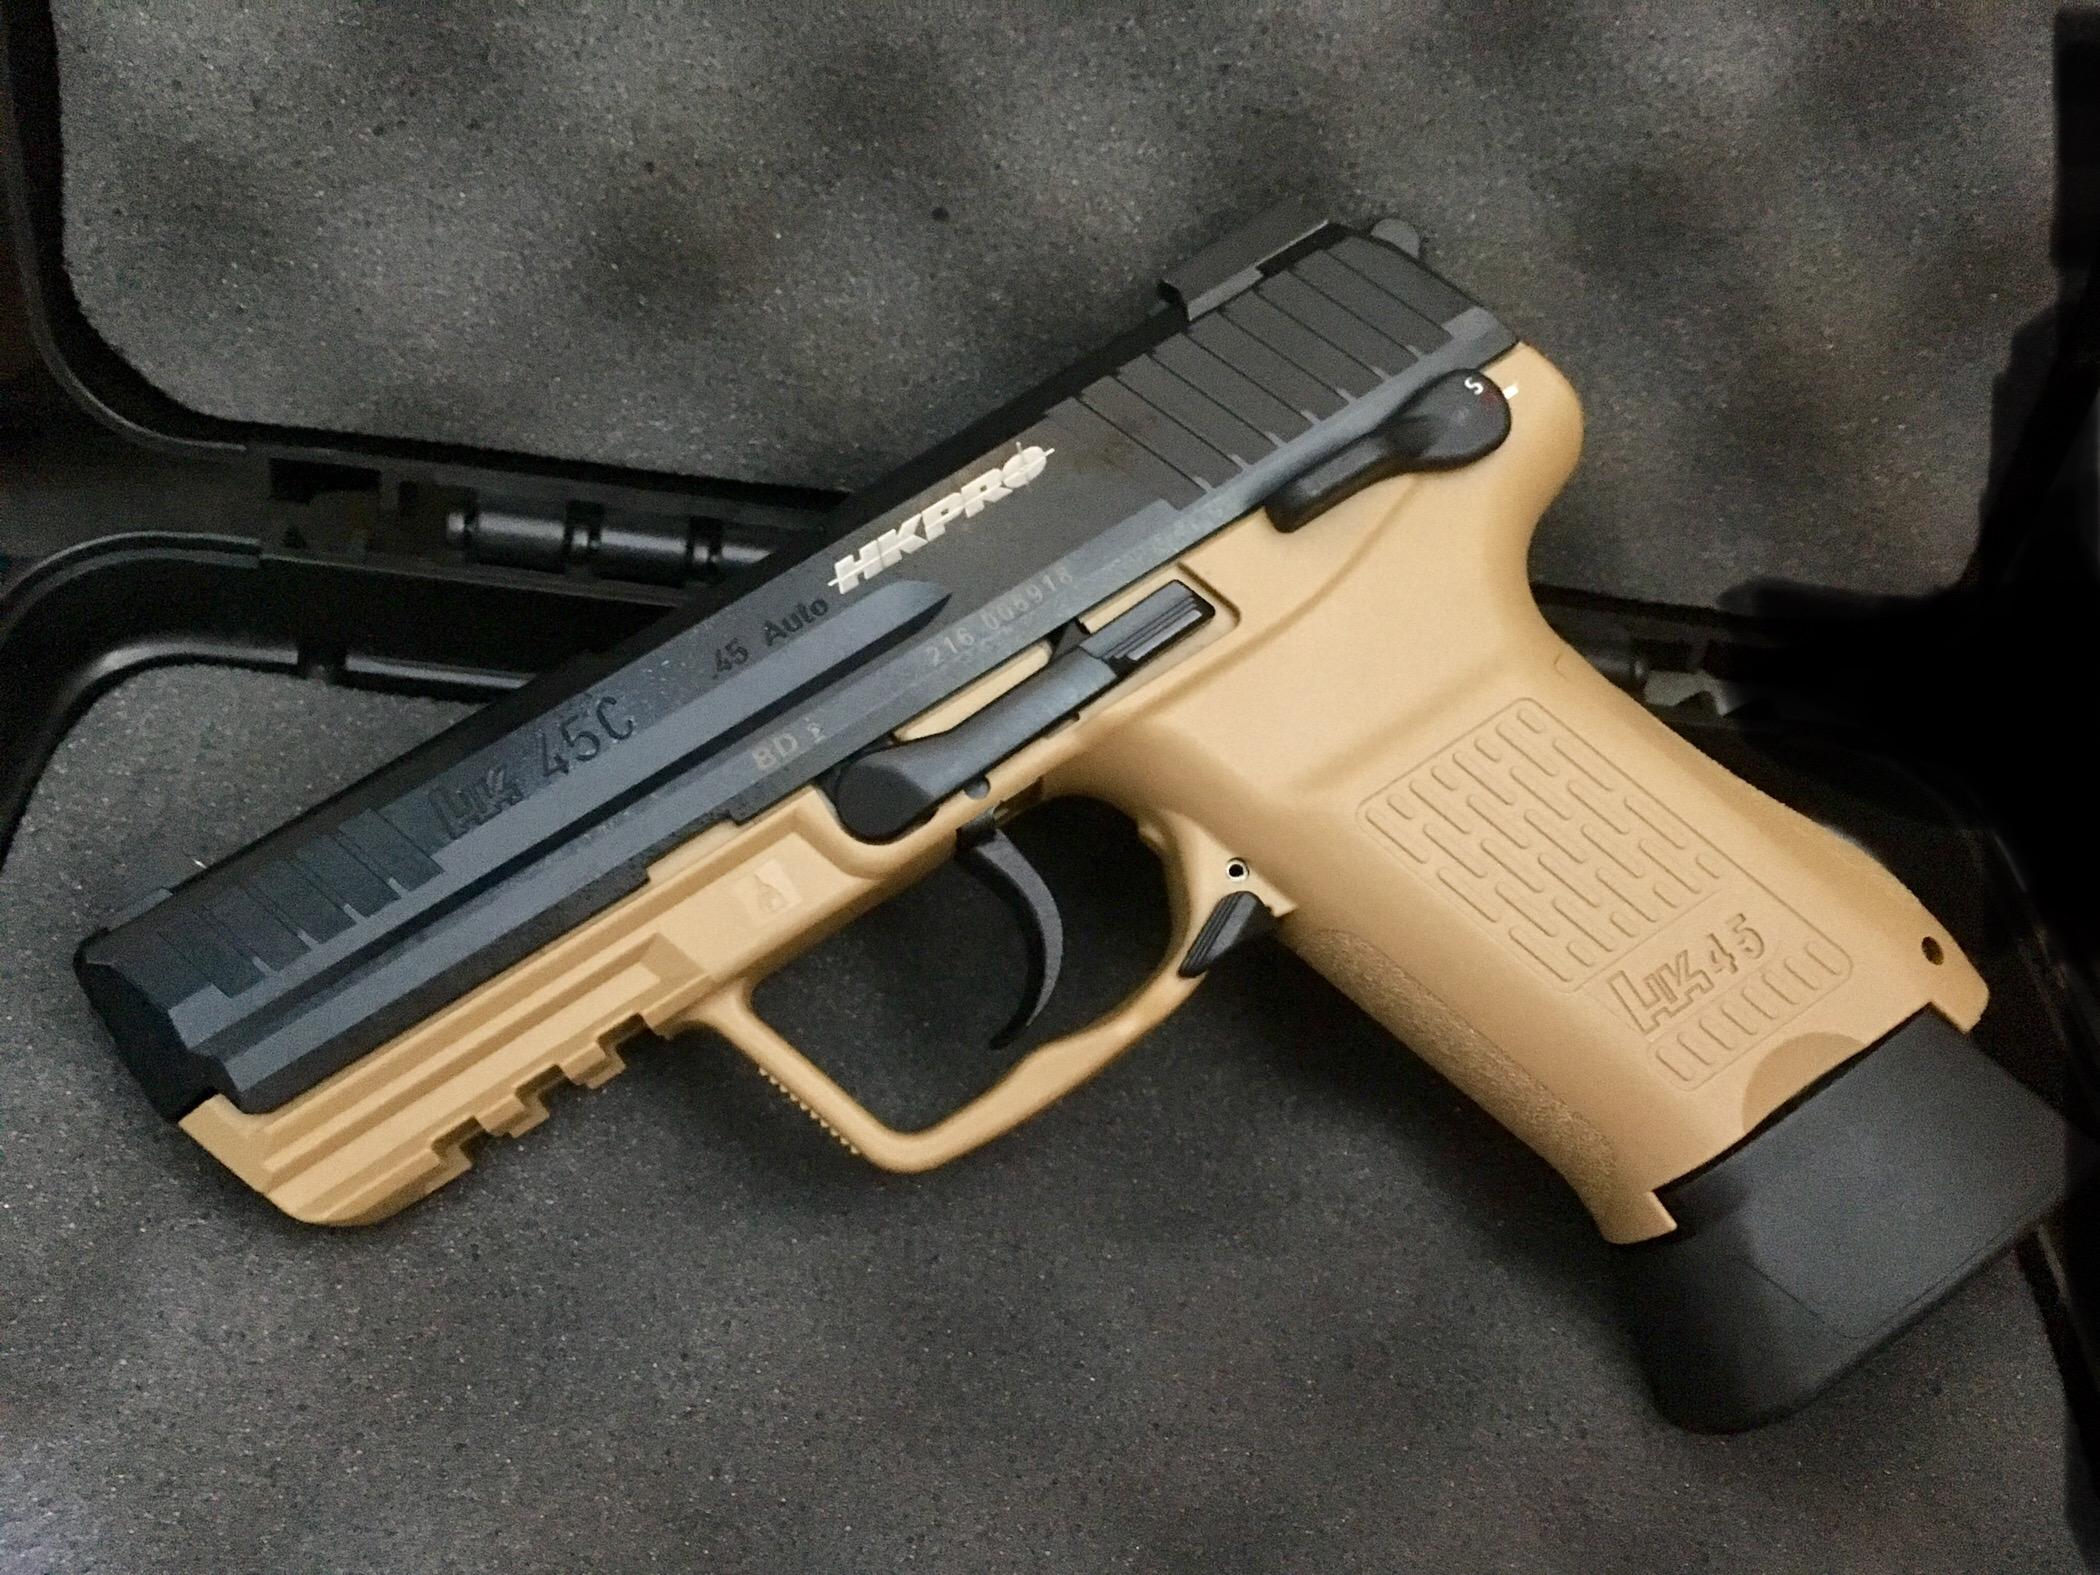 P30, P30L, HK45, HK45c PIC THREAD!-img_e6759.jpg